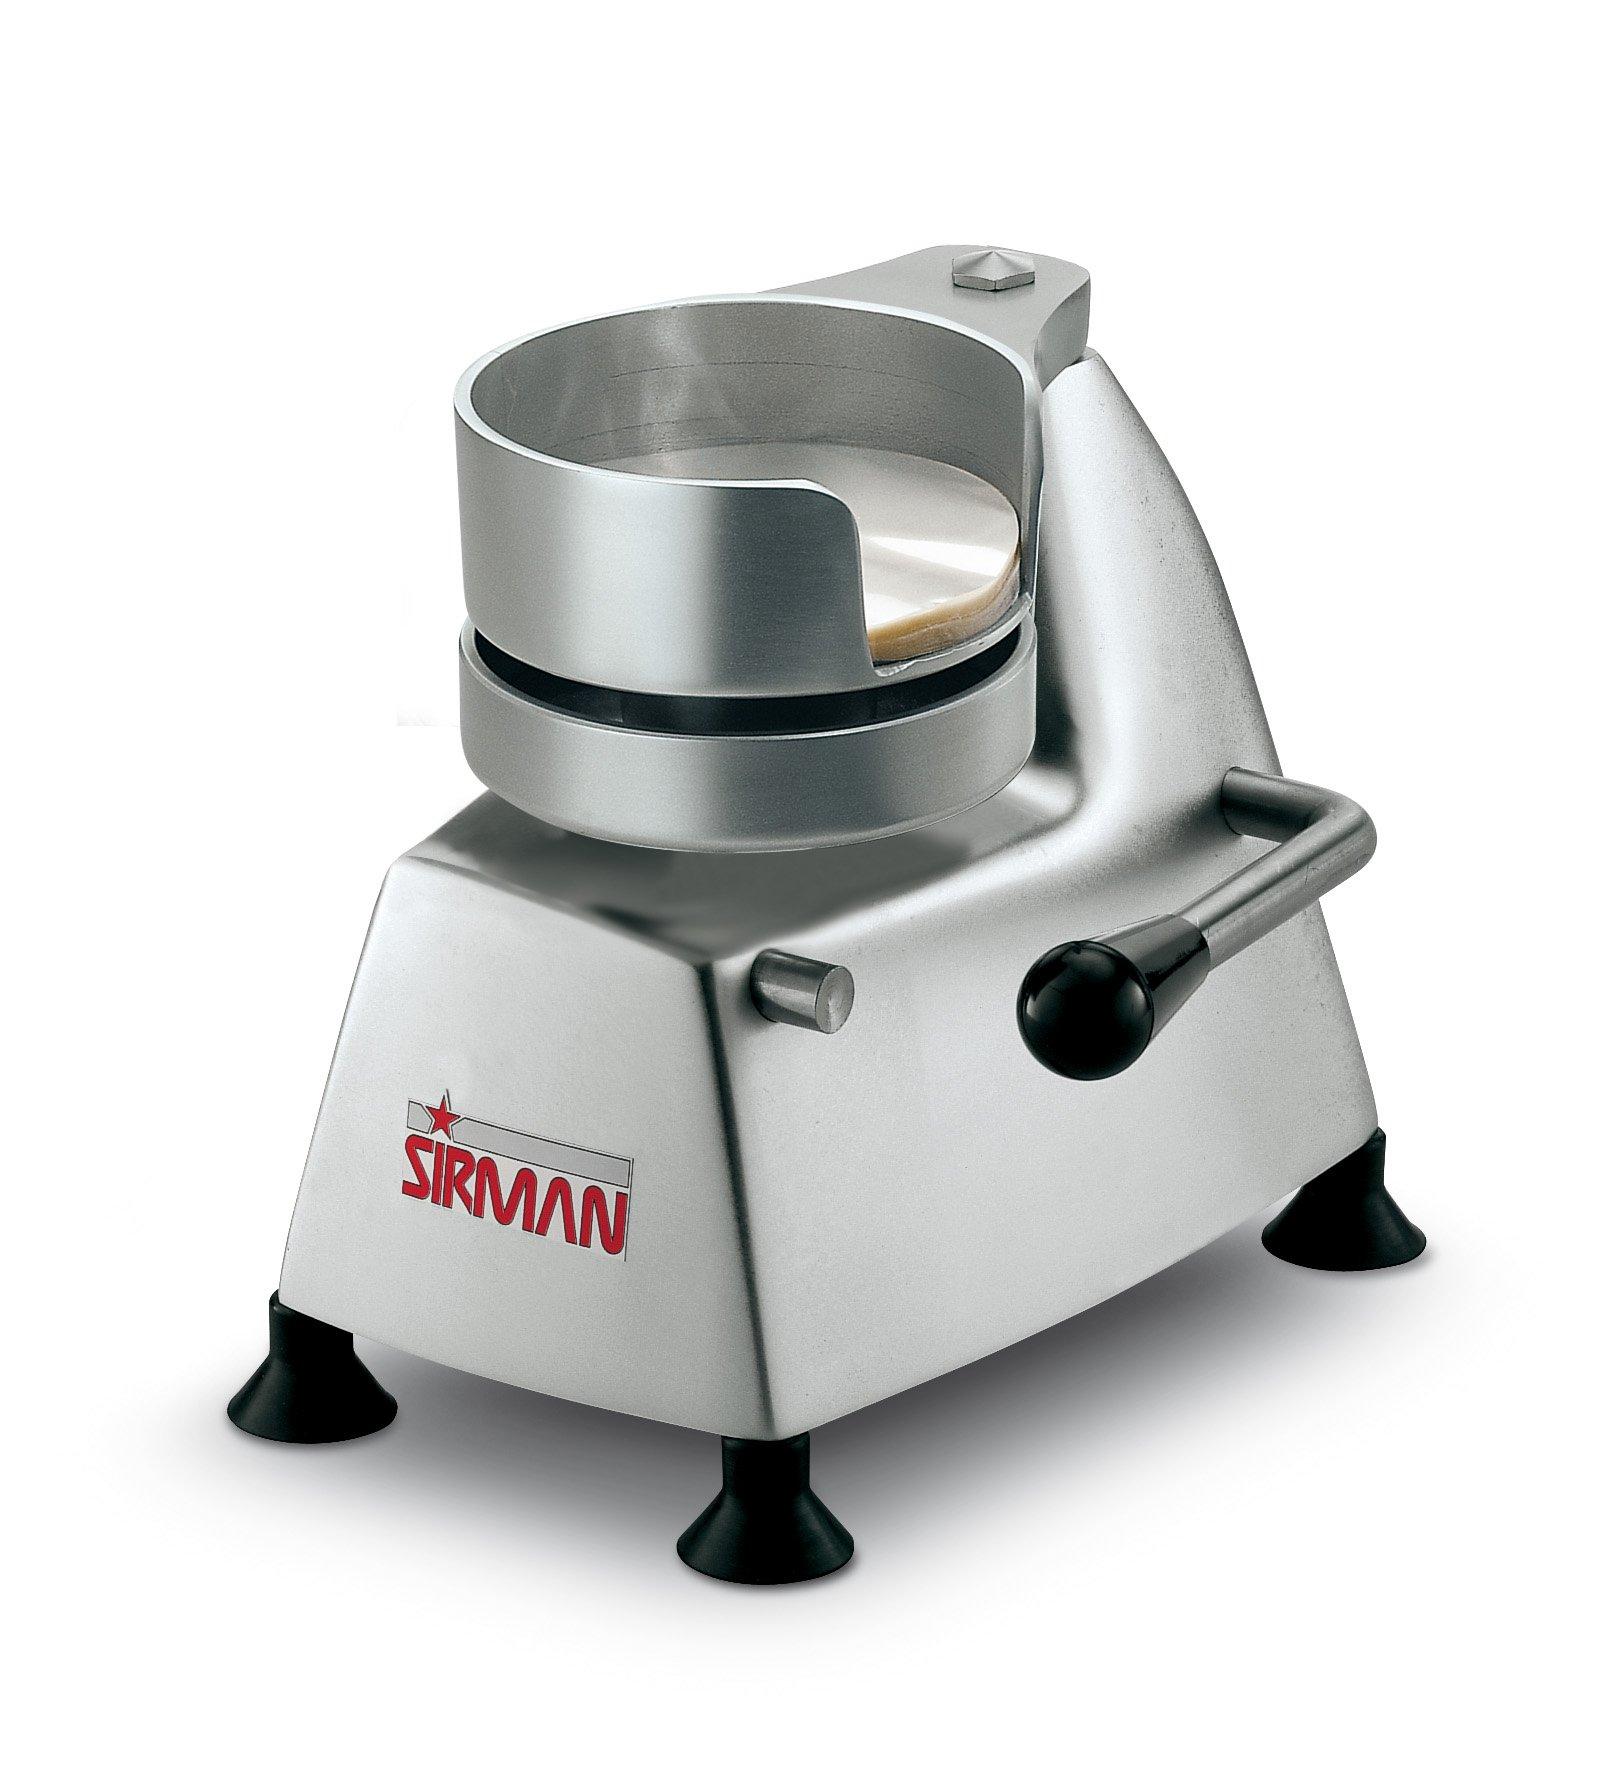 Sirman SA 100 Manual Patty Presses, 4-Inch Diameter Mold